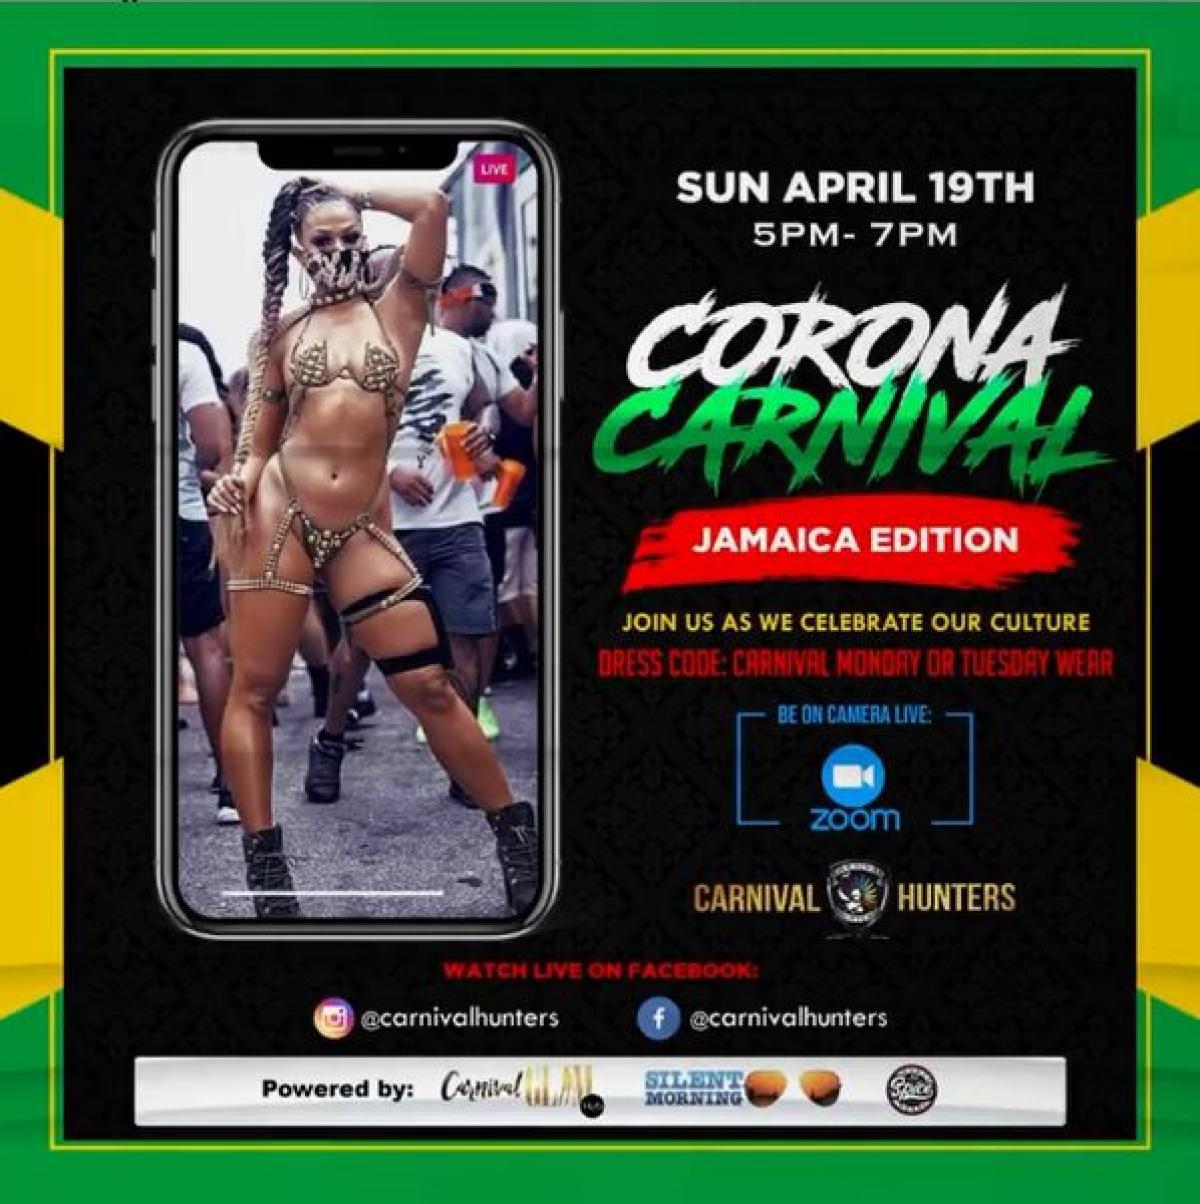 Corona Carnival Jamaica Edition flyer or graphic.